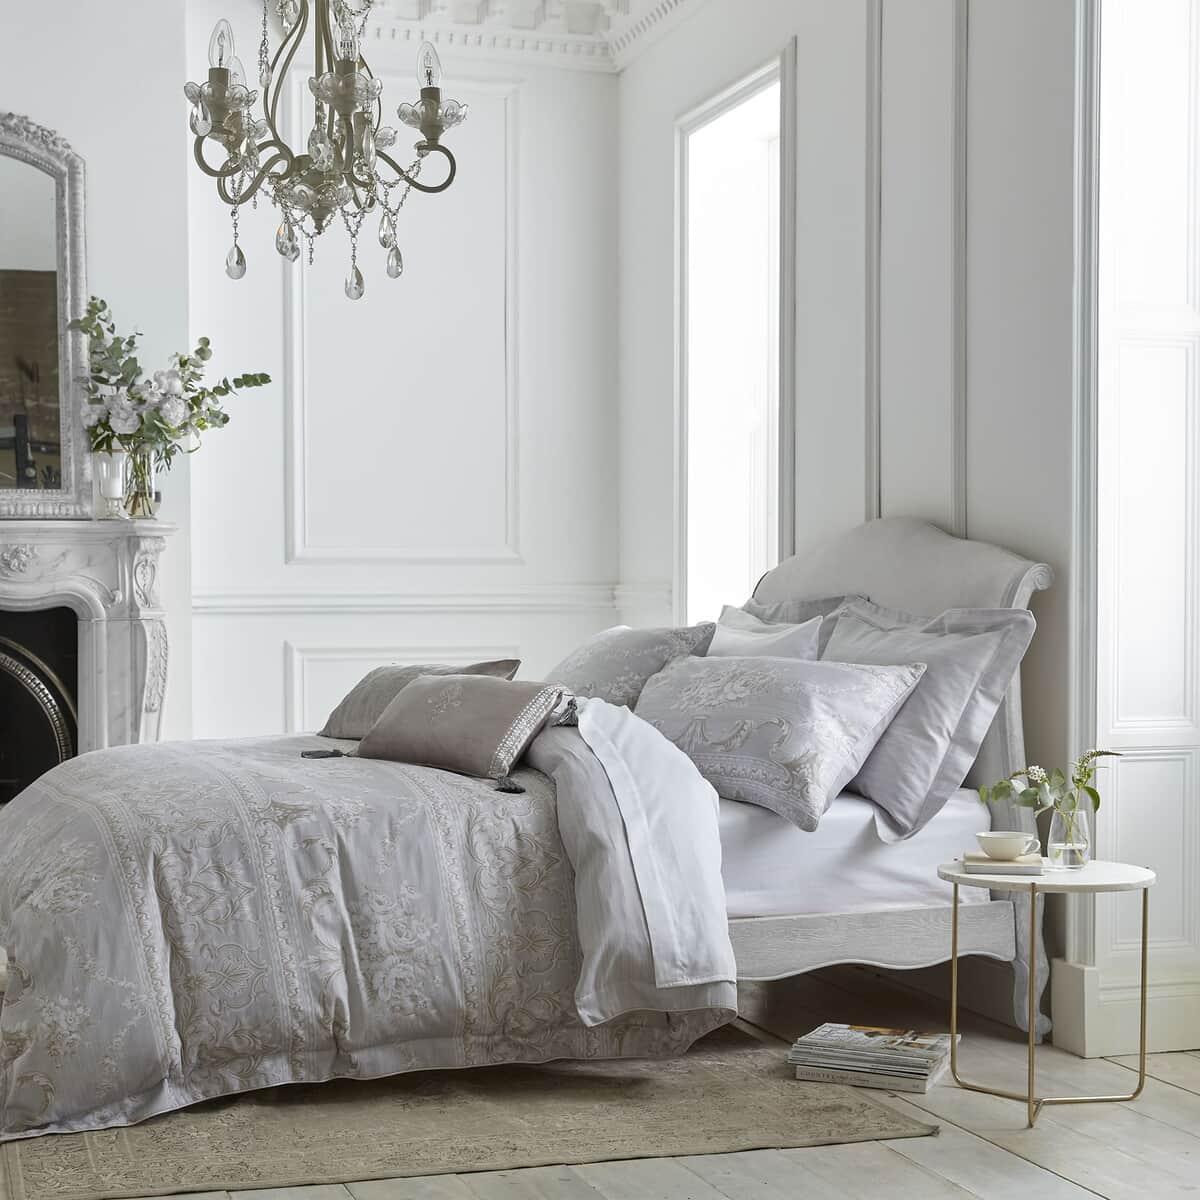 Dorma Cheverny Grey large